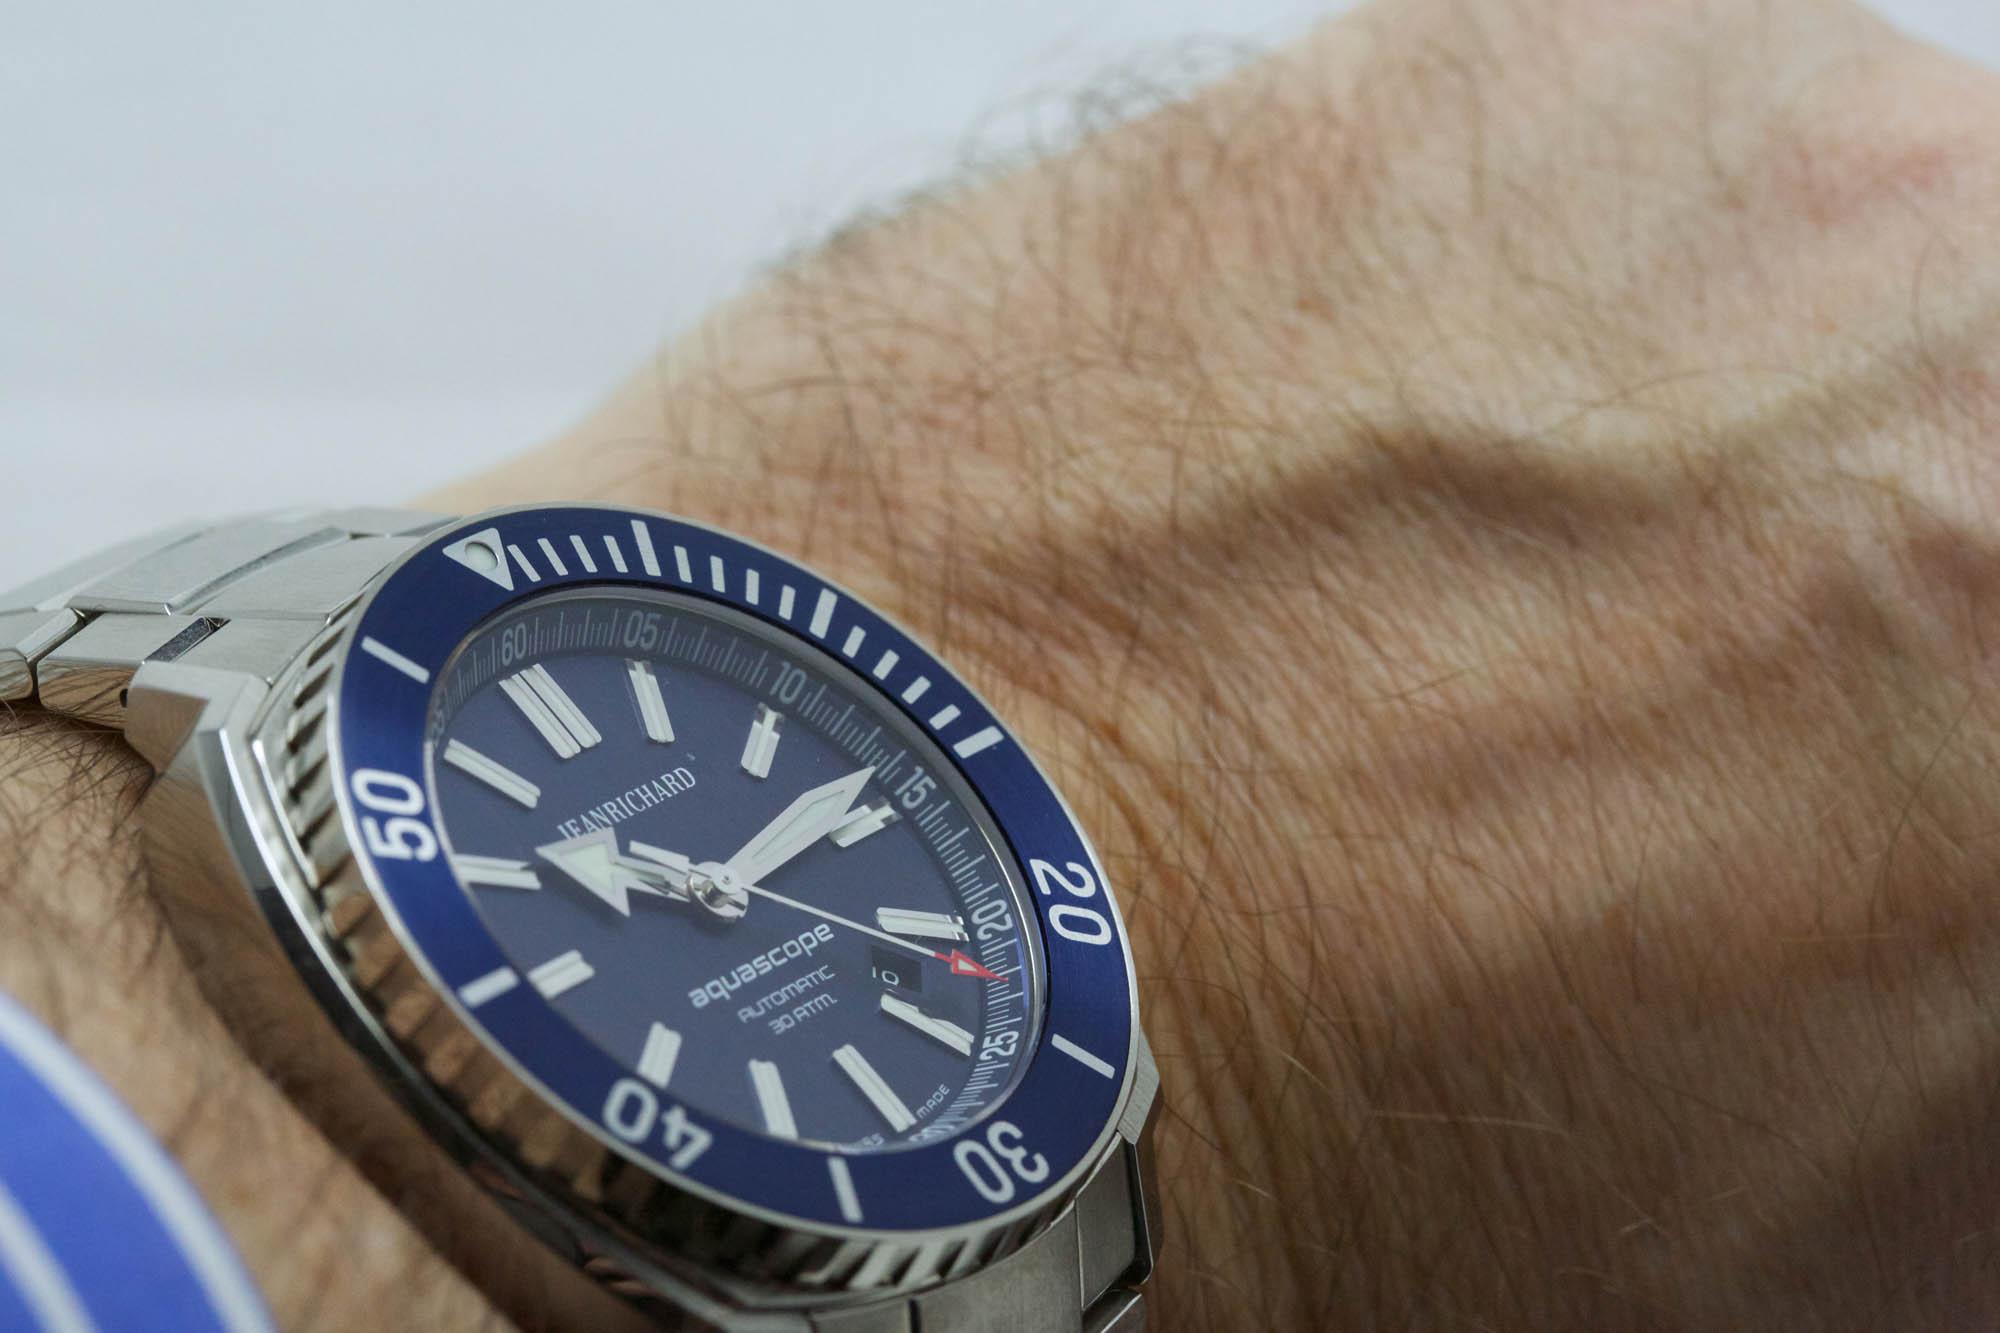 JeanRichard Aquascope Blue Dial - Wristshot